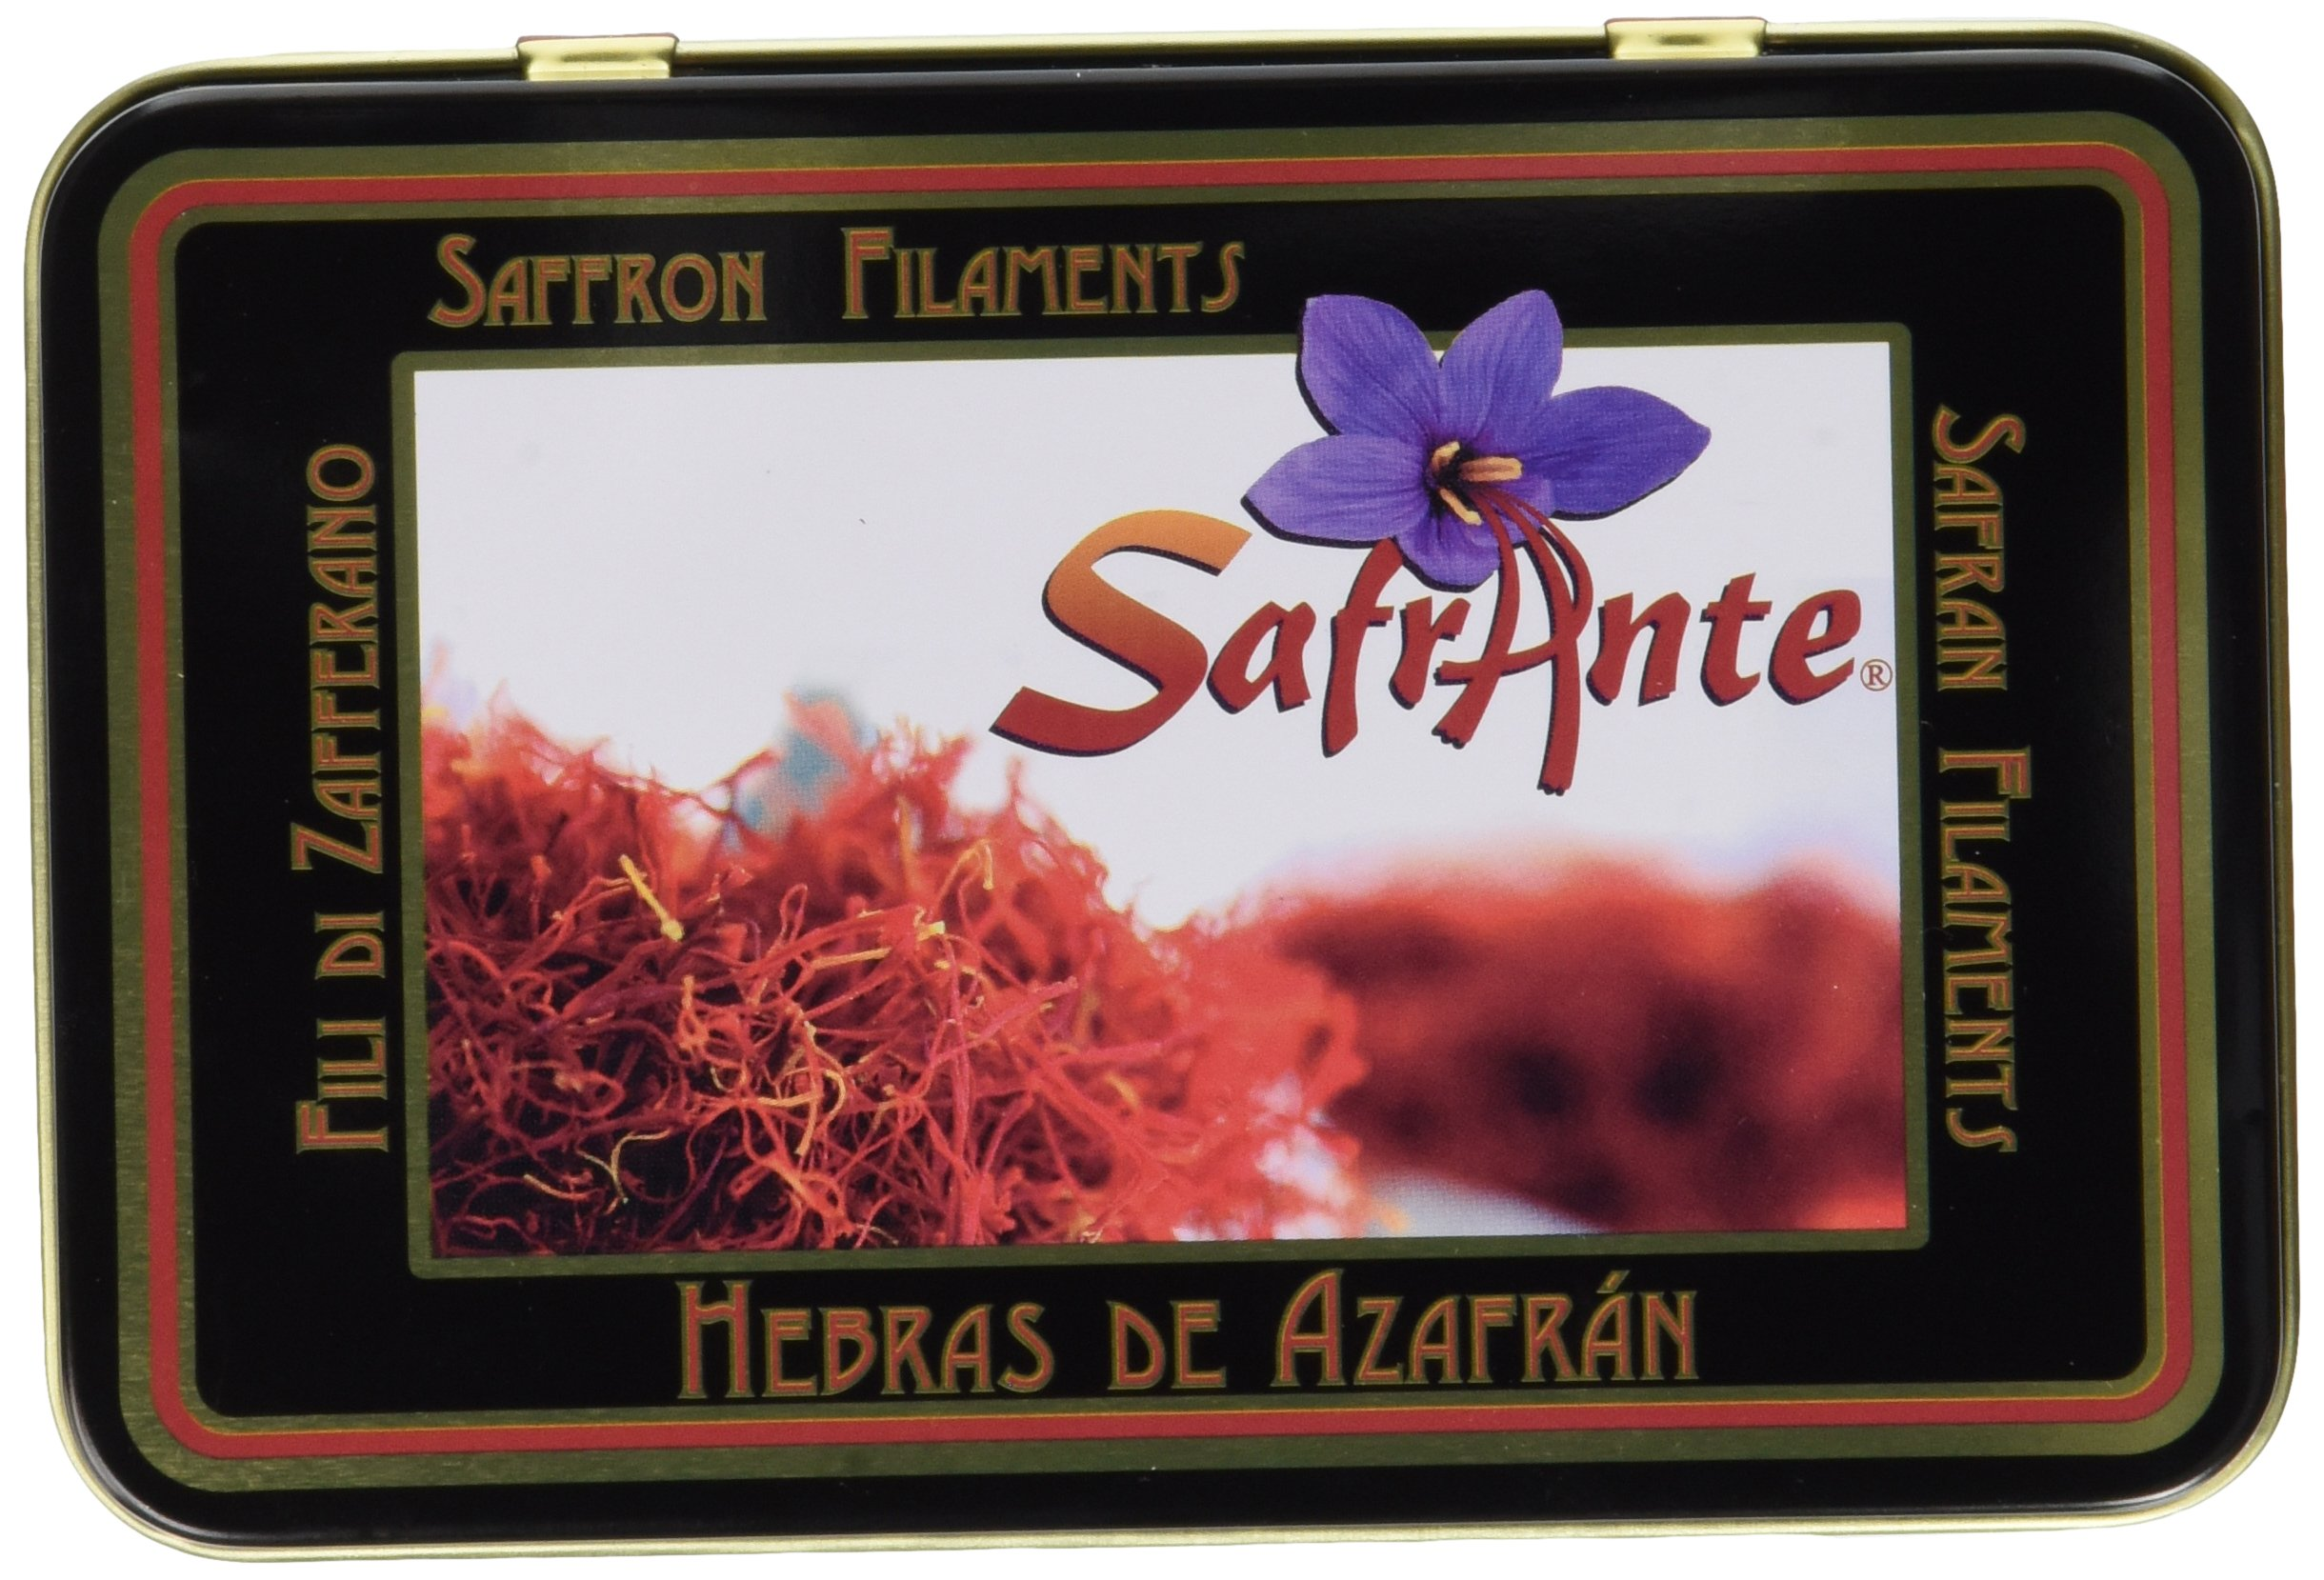 Safrante Pure Spanish Saffron Tin, 1 Ounce (28.35 Grams)